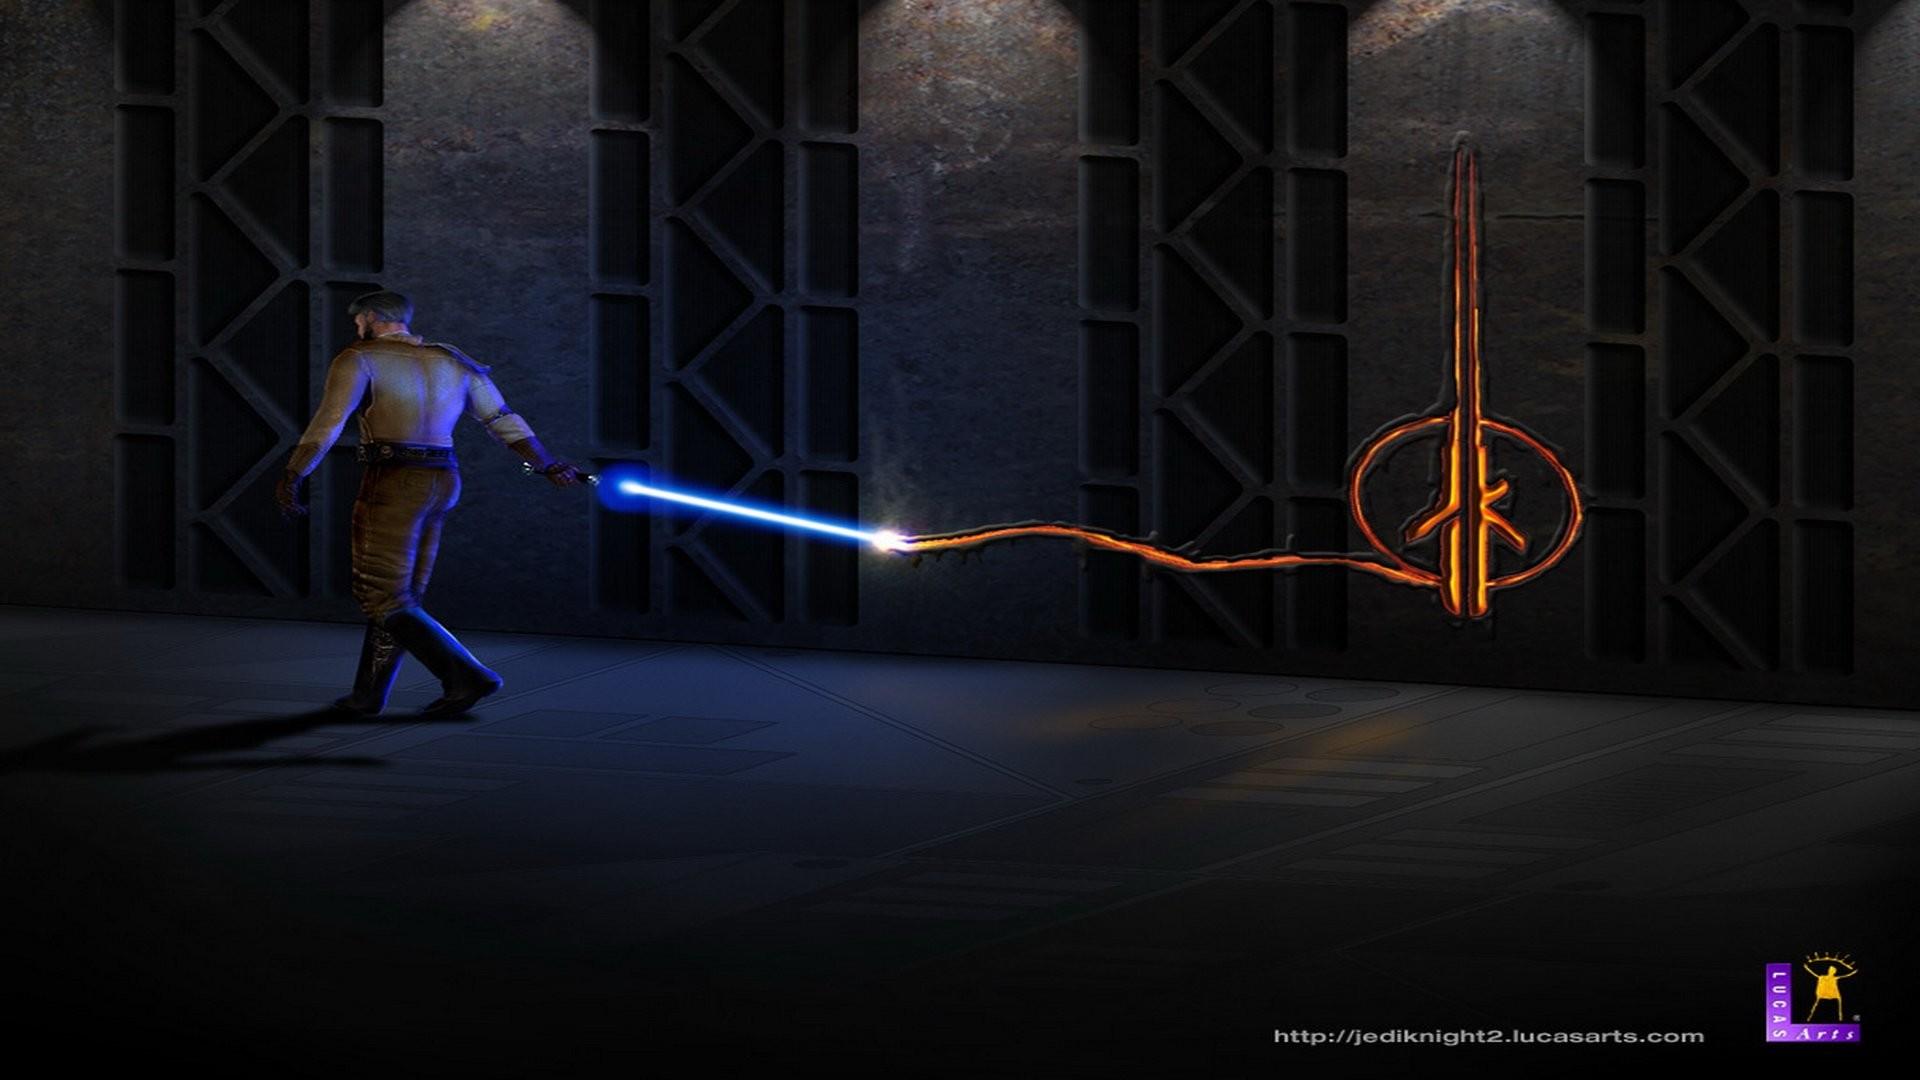 Lightsaber Iphone Wallpaper Hd Jedi Wallpaper 68 Images